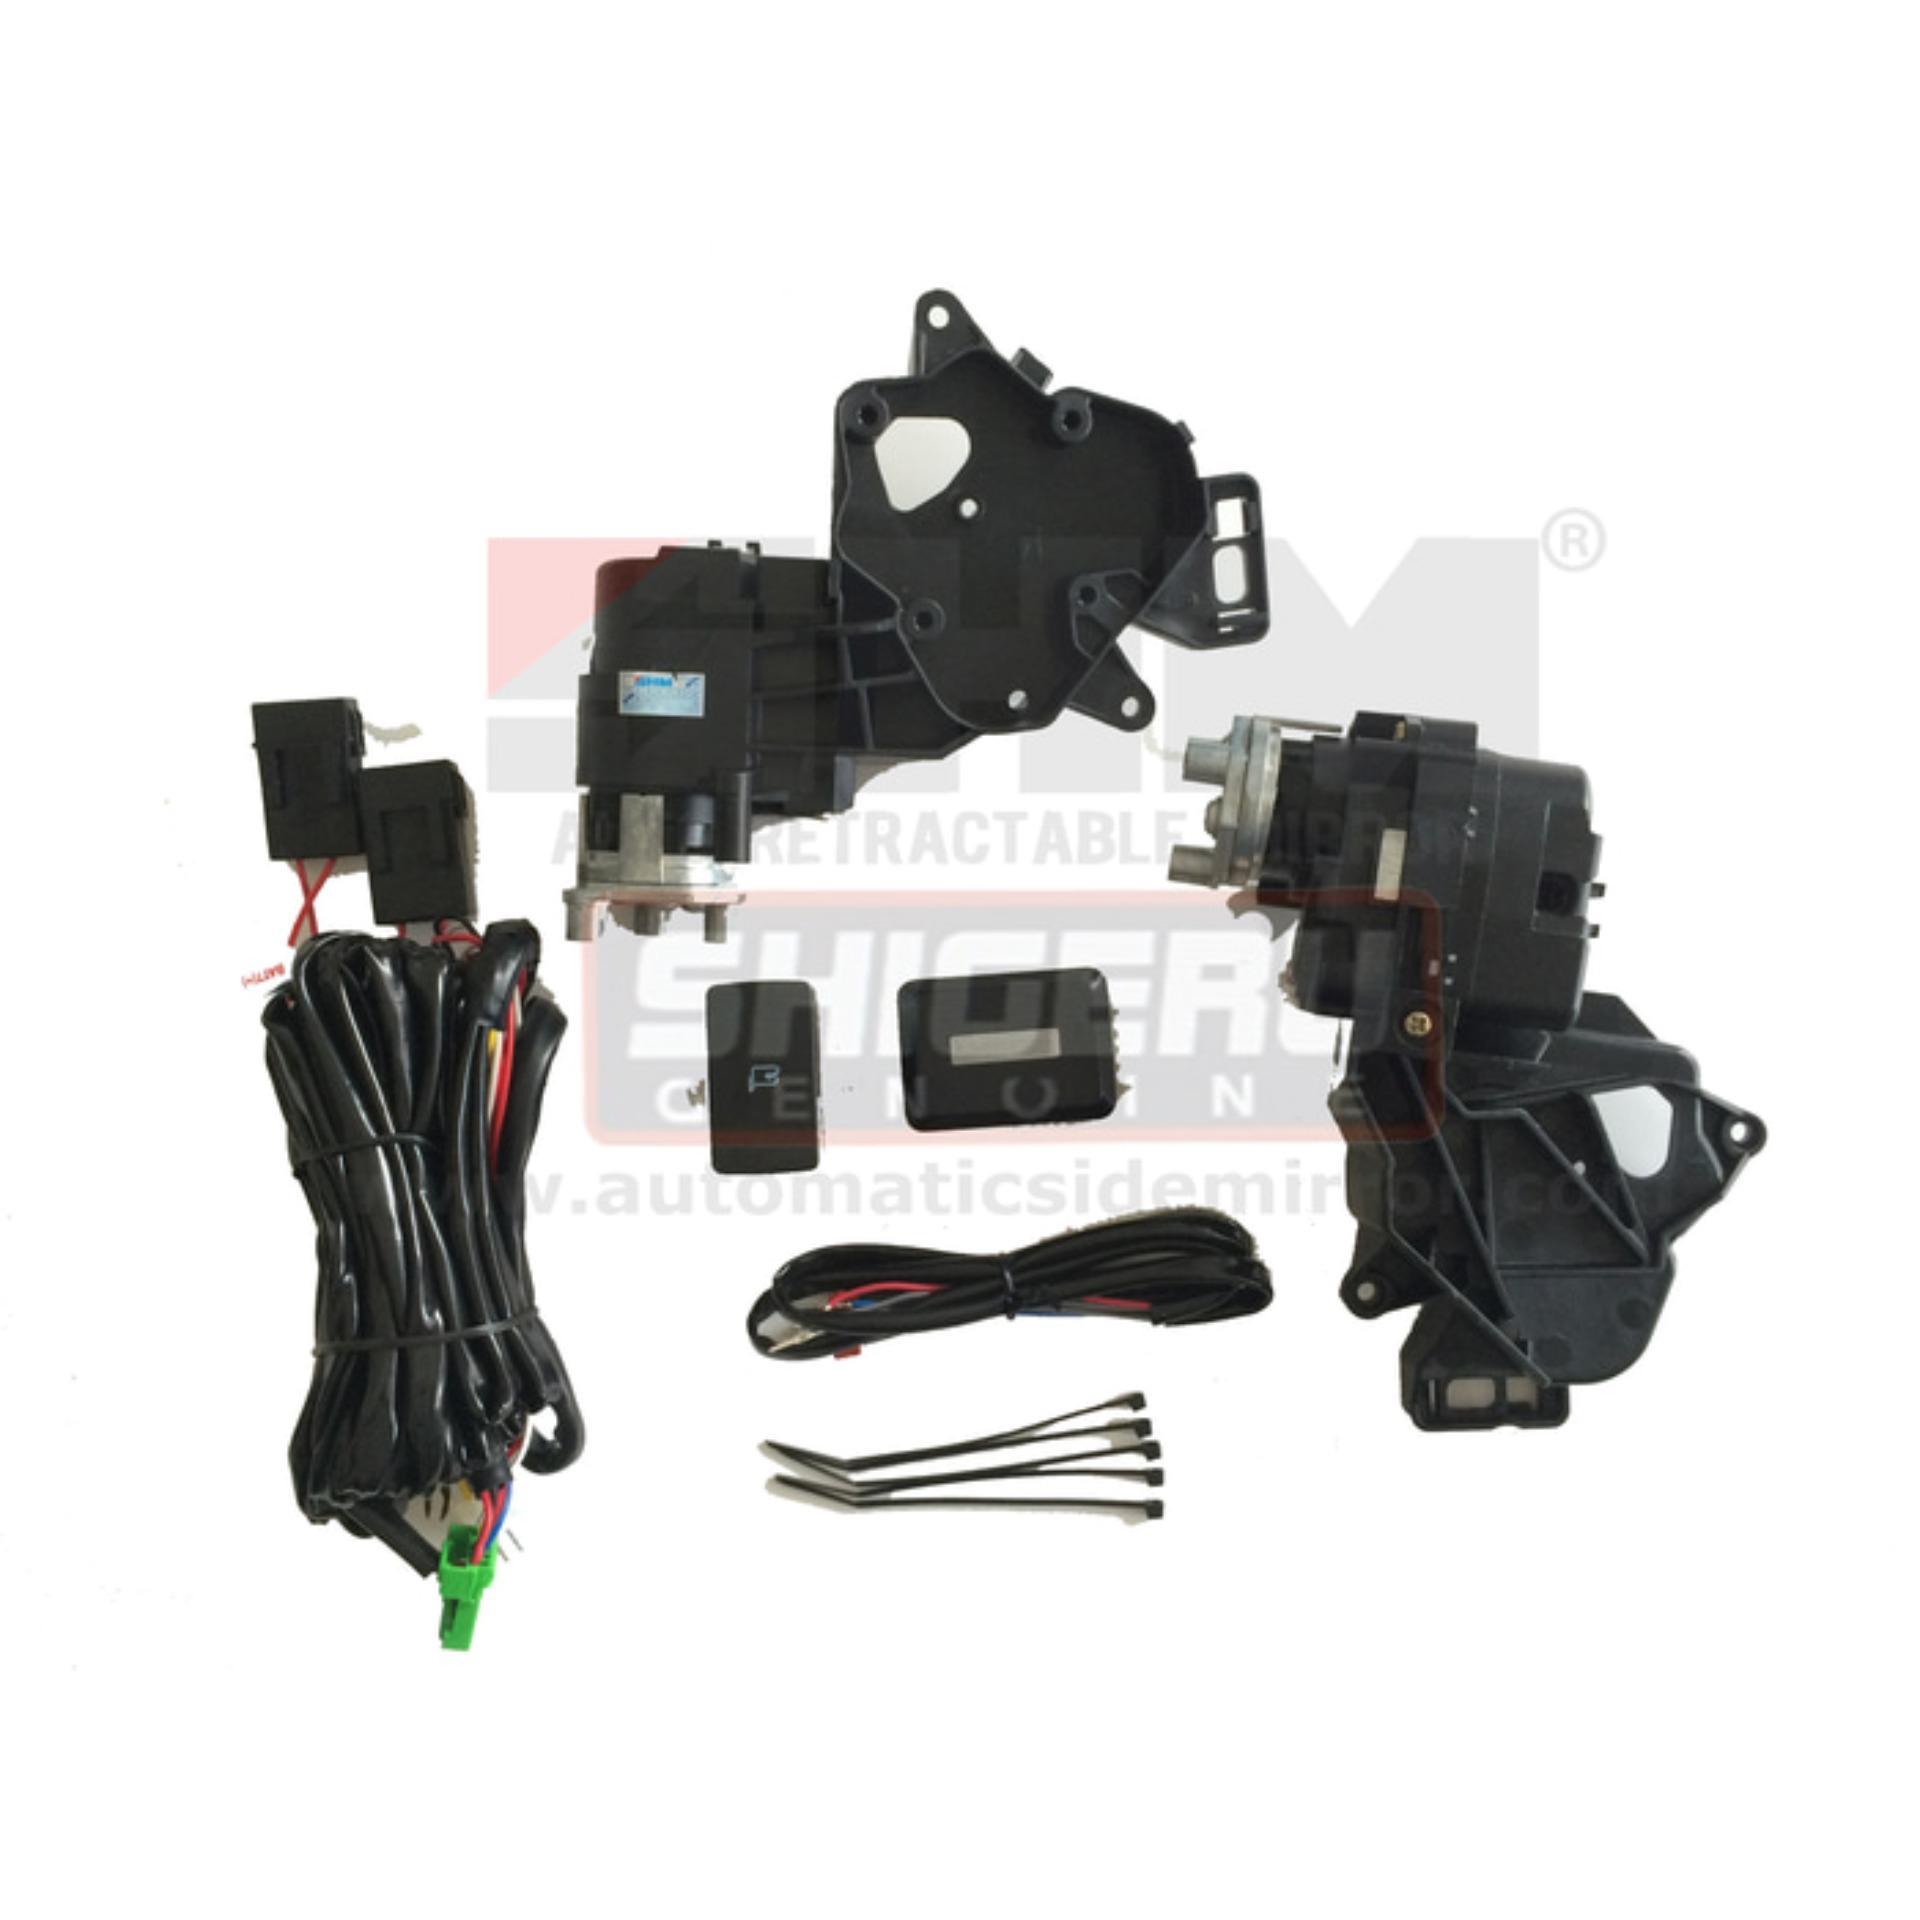 Retractable Mirror /  Retract Mirror Kit Nissan New Livina